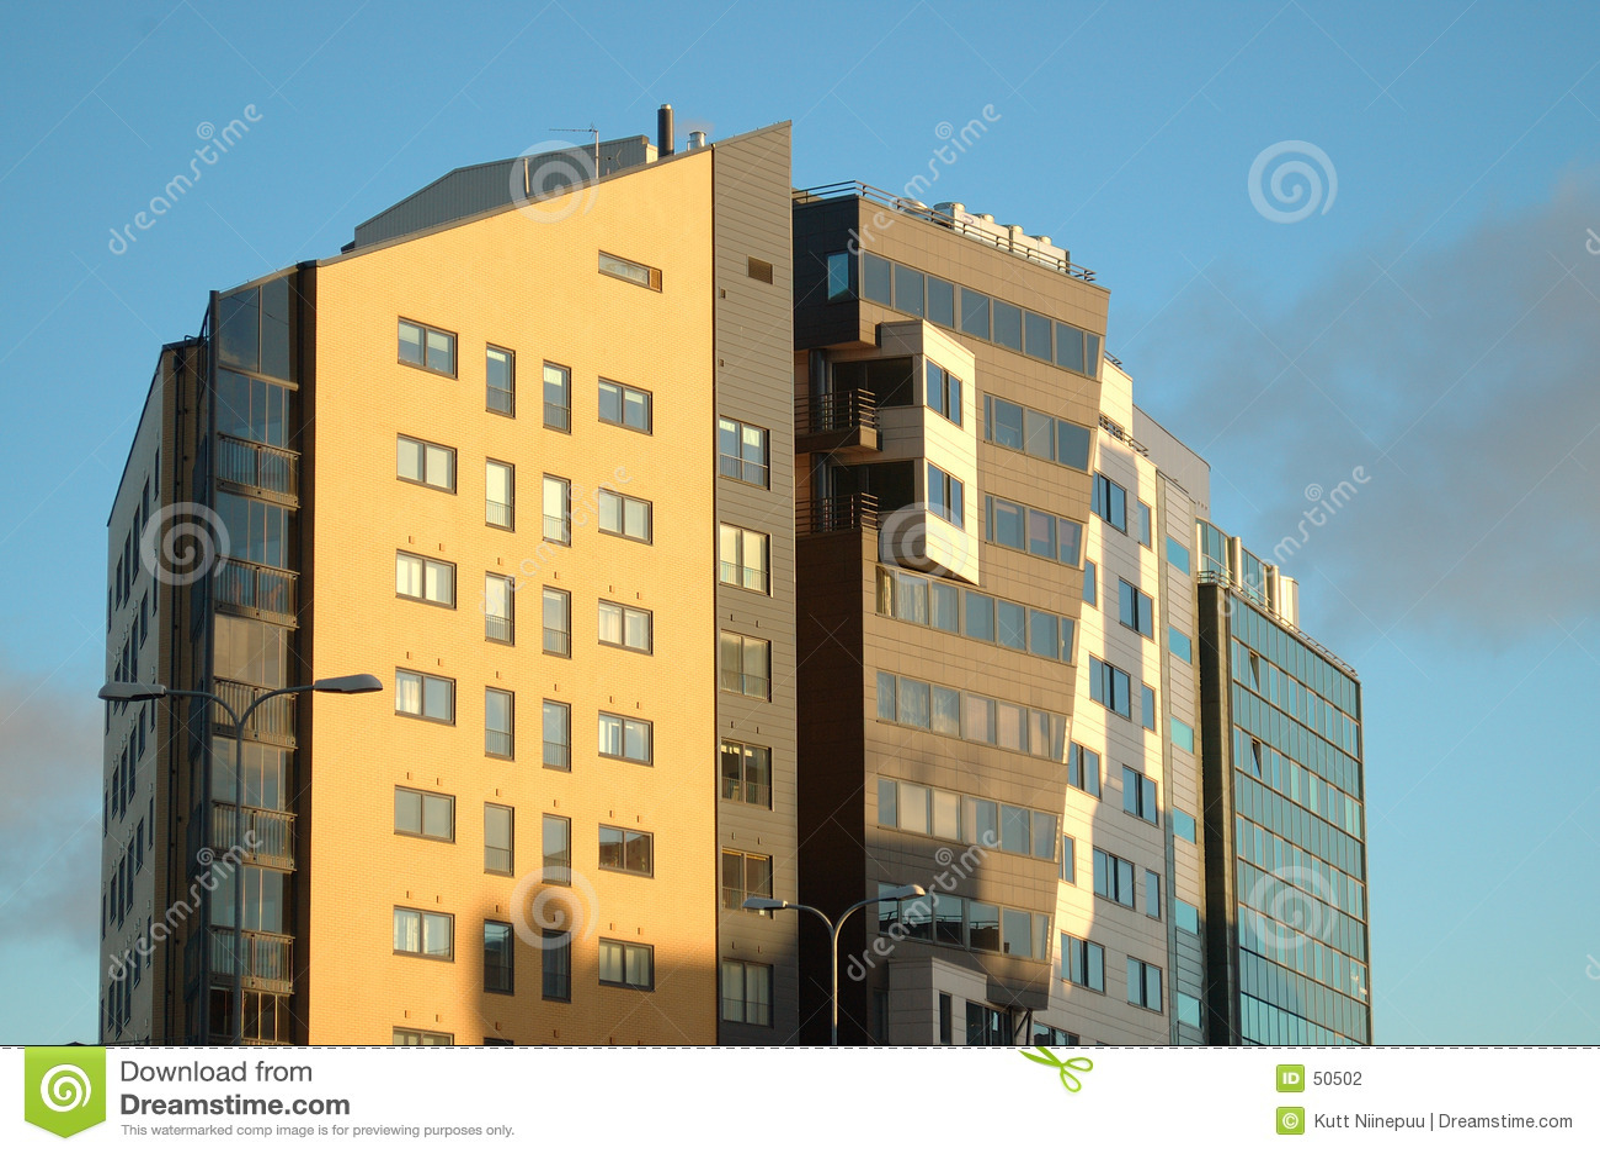 Maravilha arquitectónica